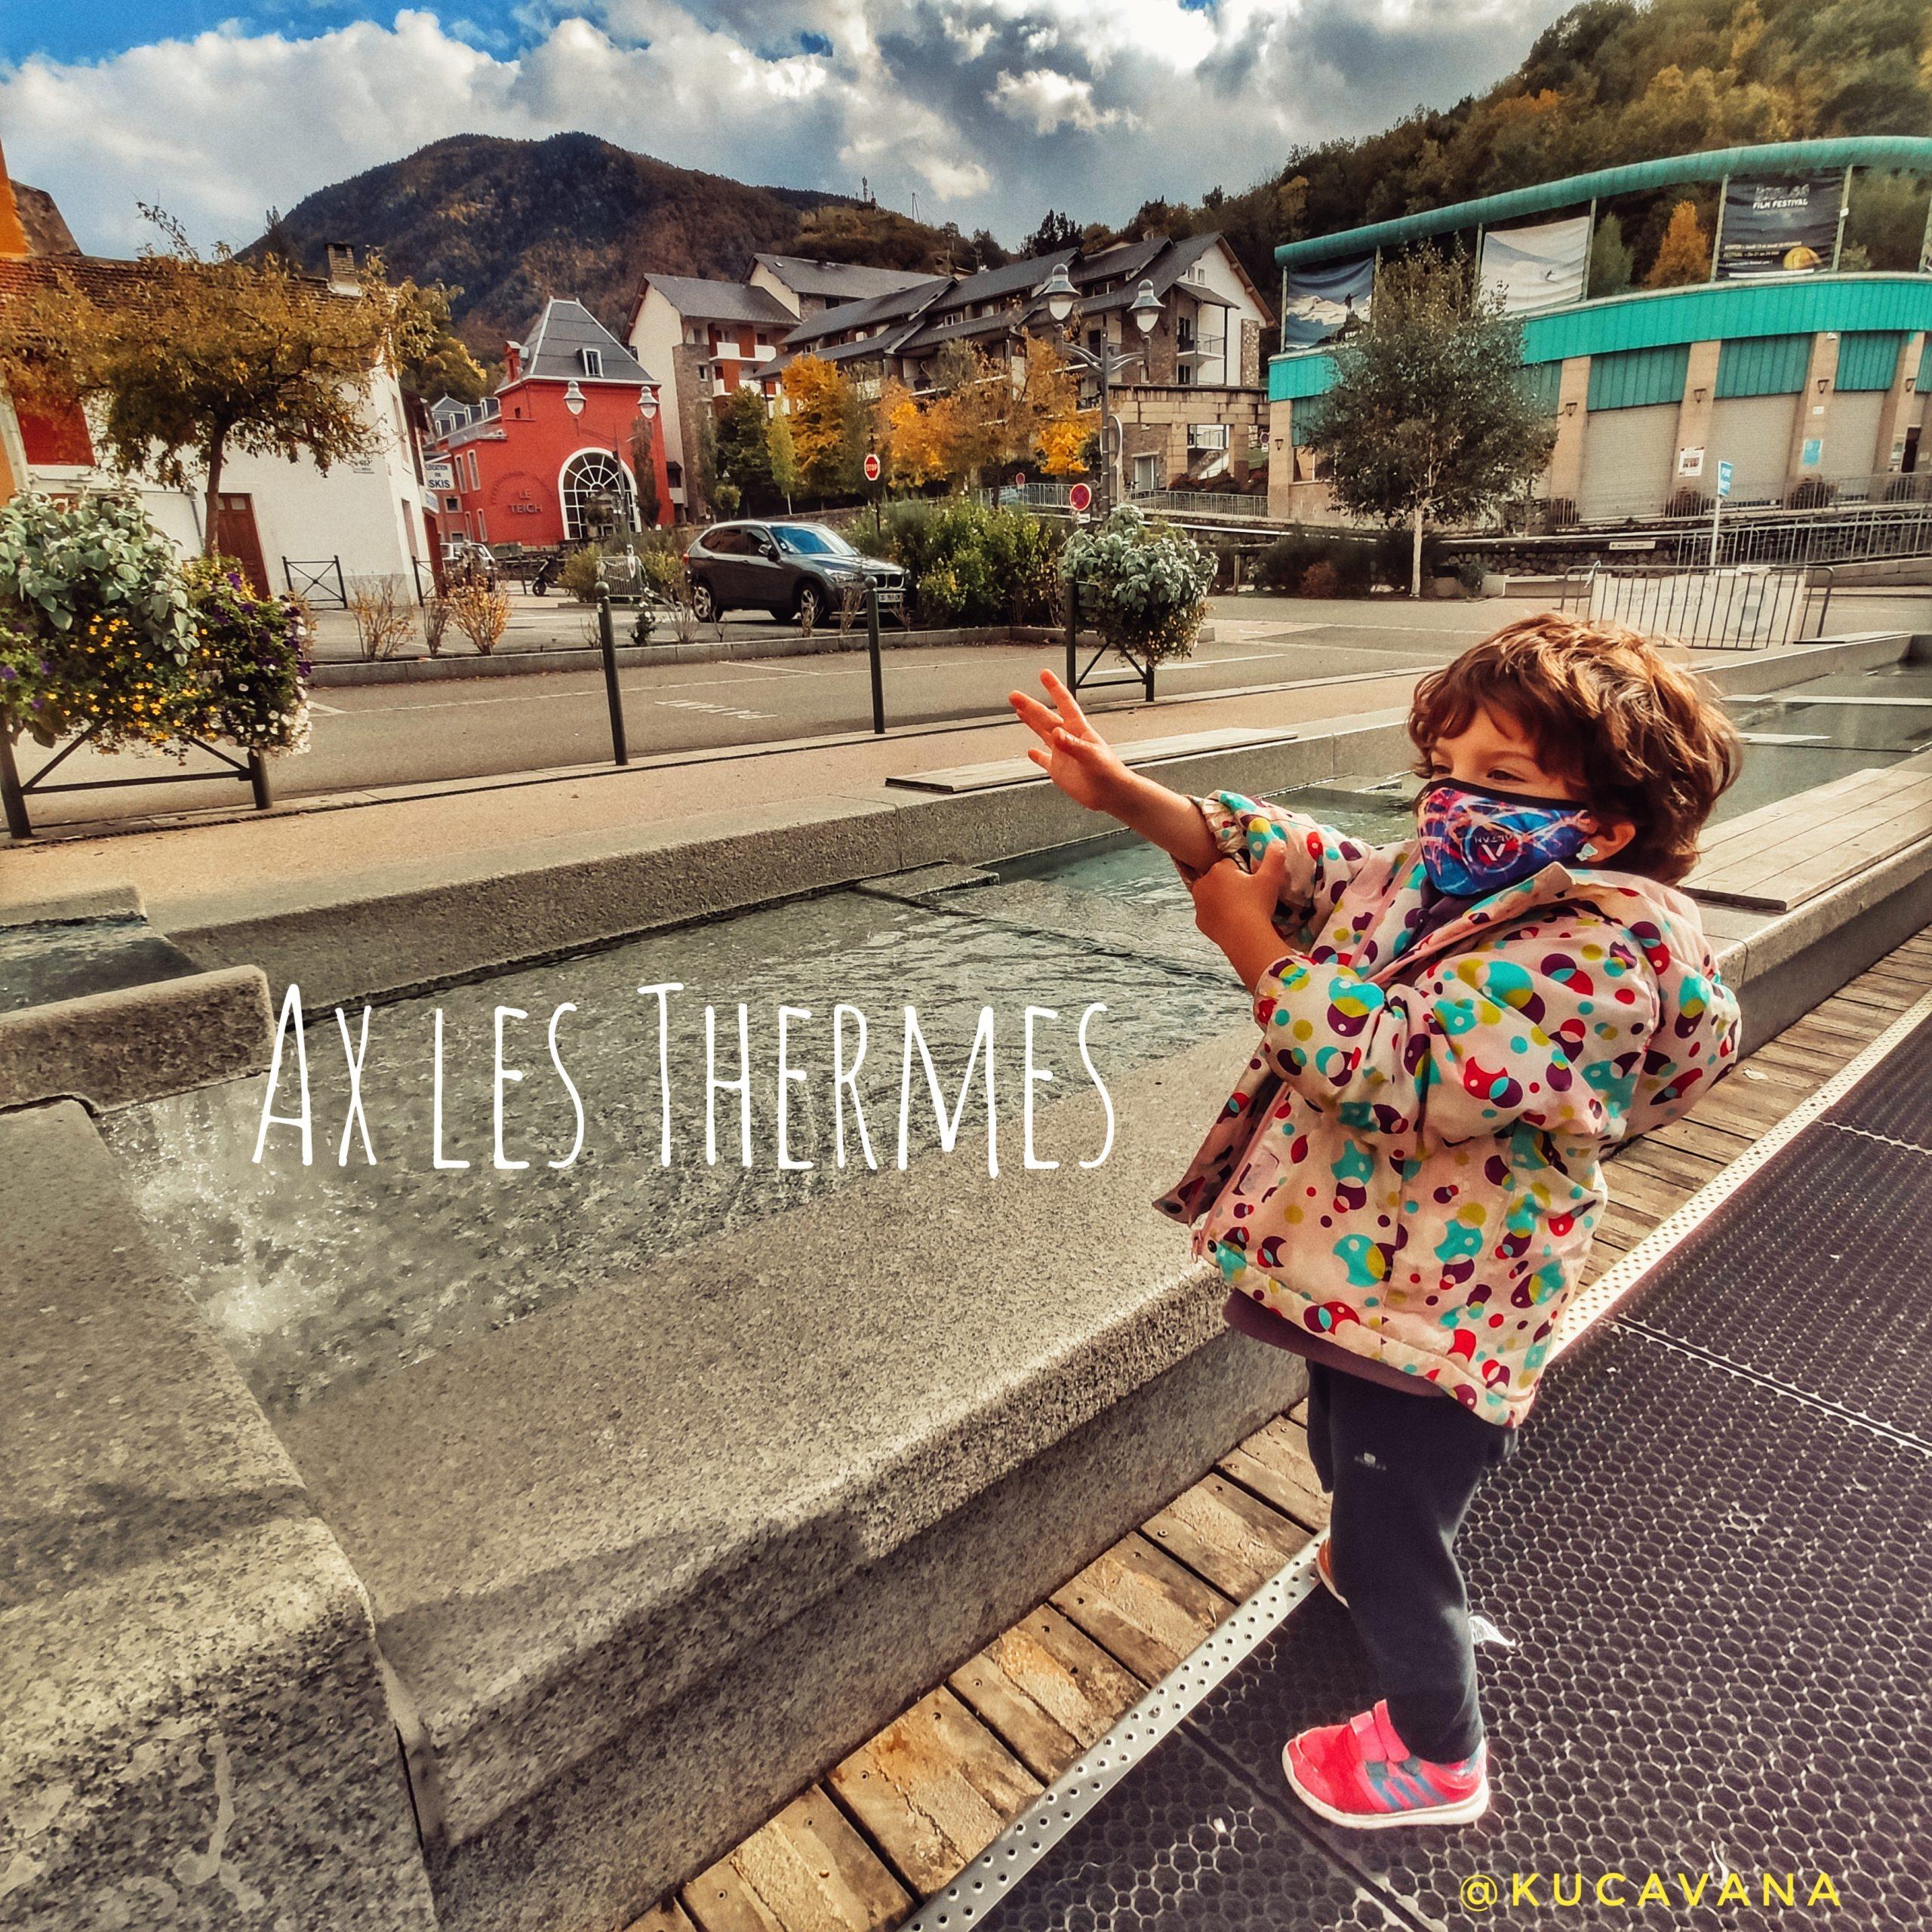 Ax les Thermes, el pueblo balneario del Pirineo francés